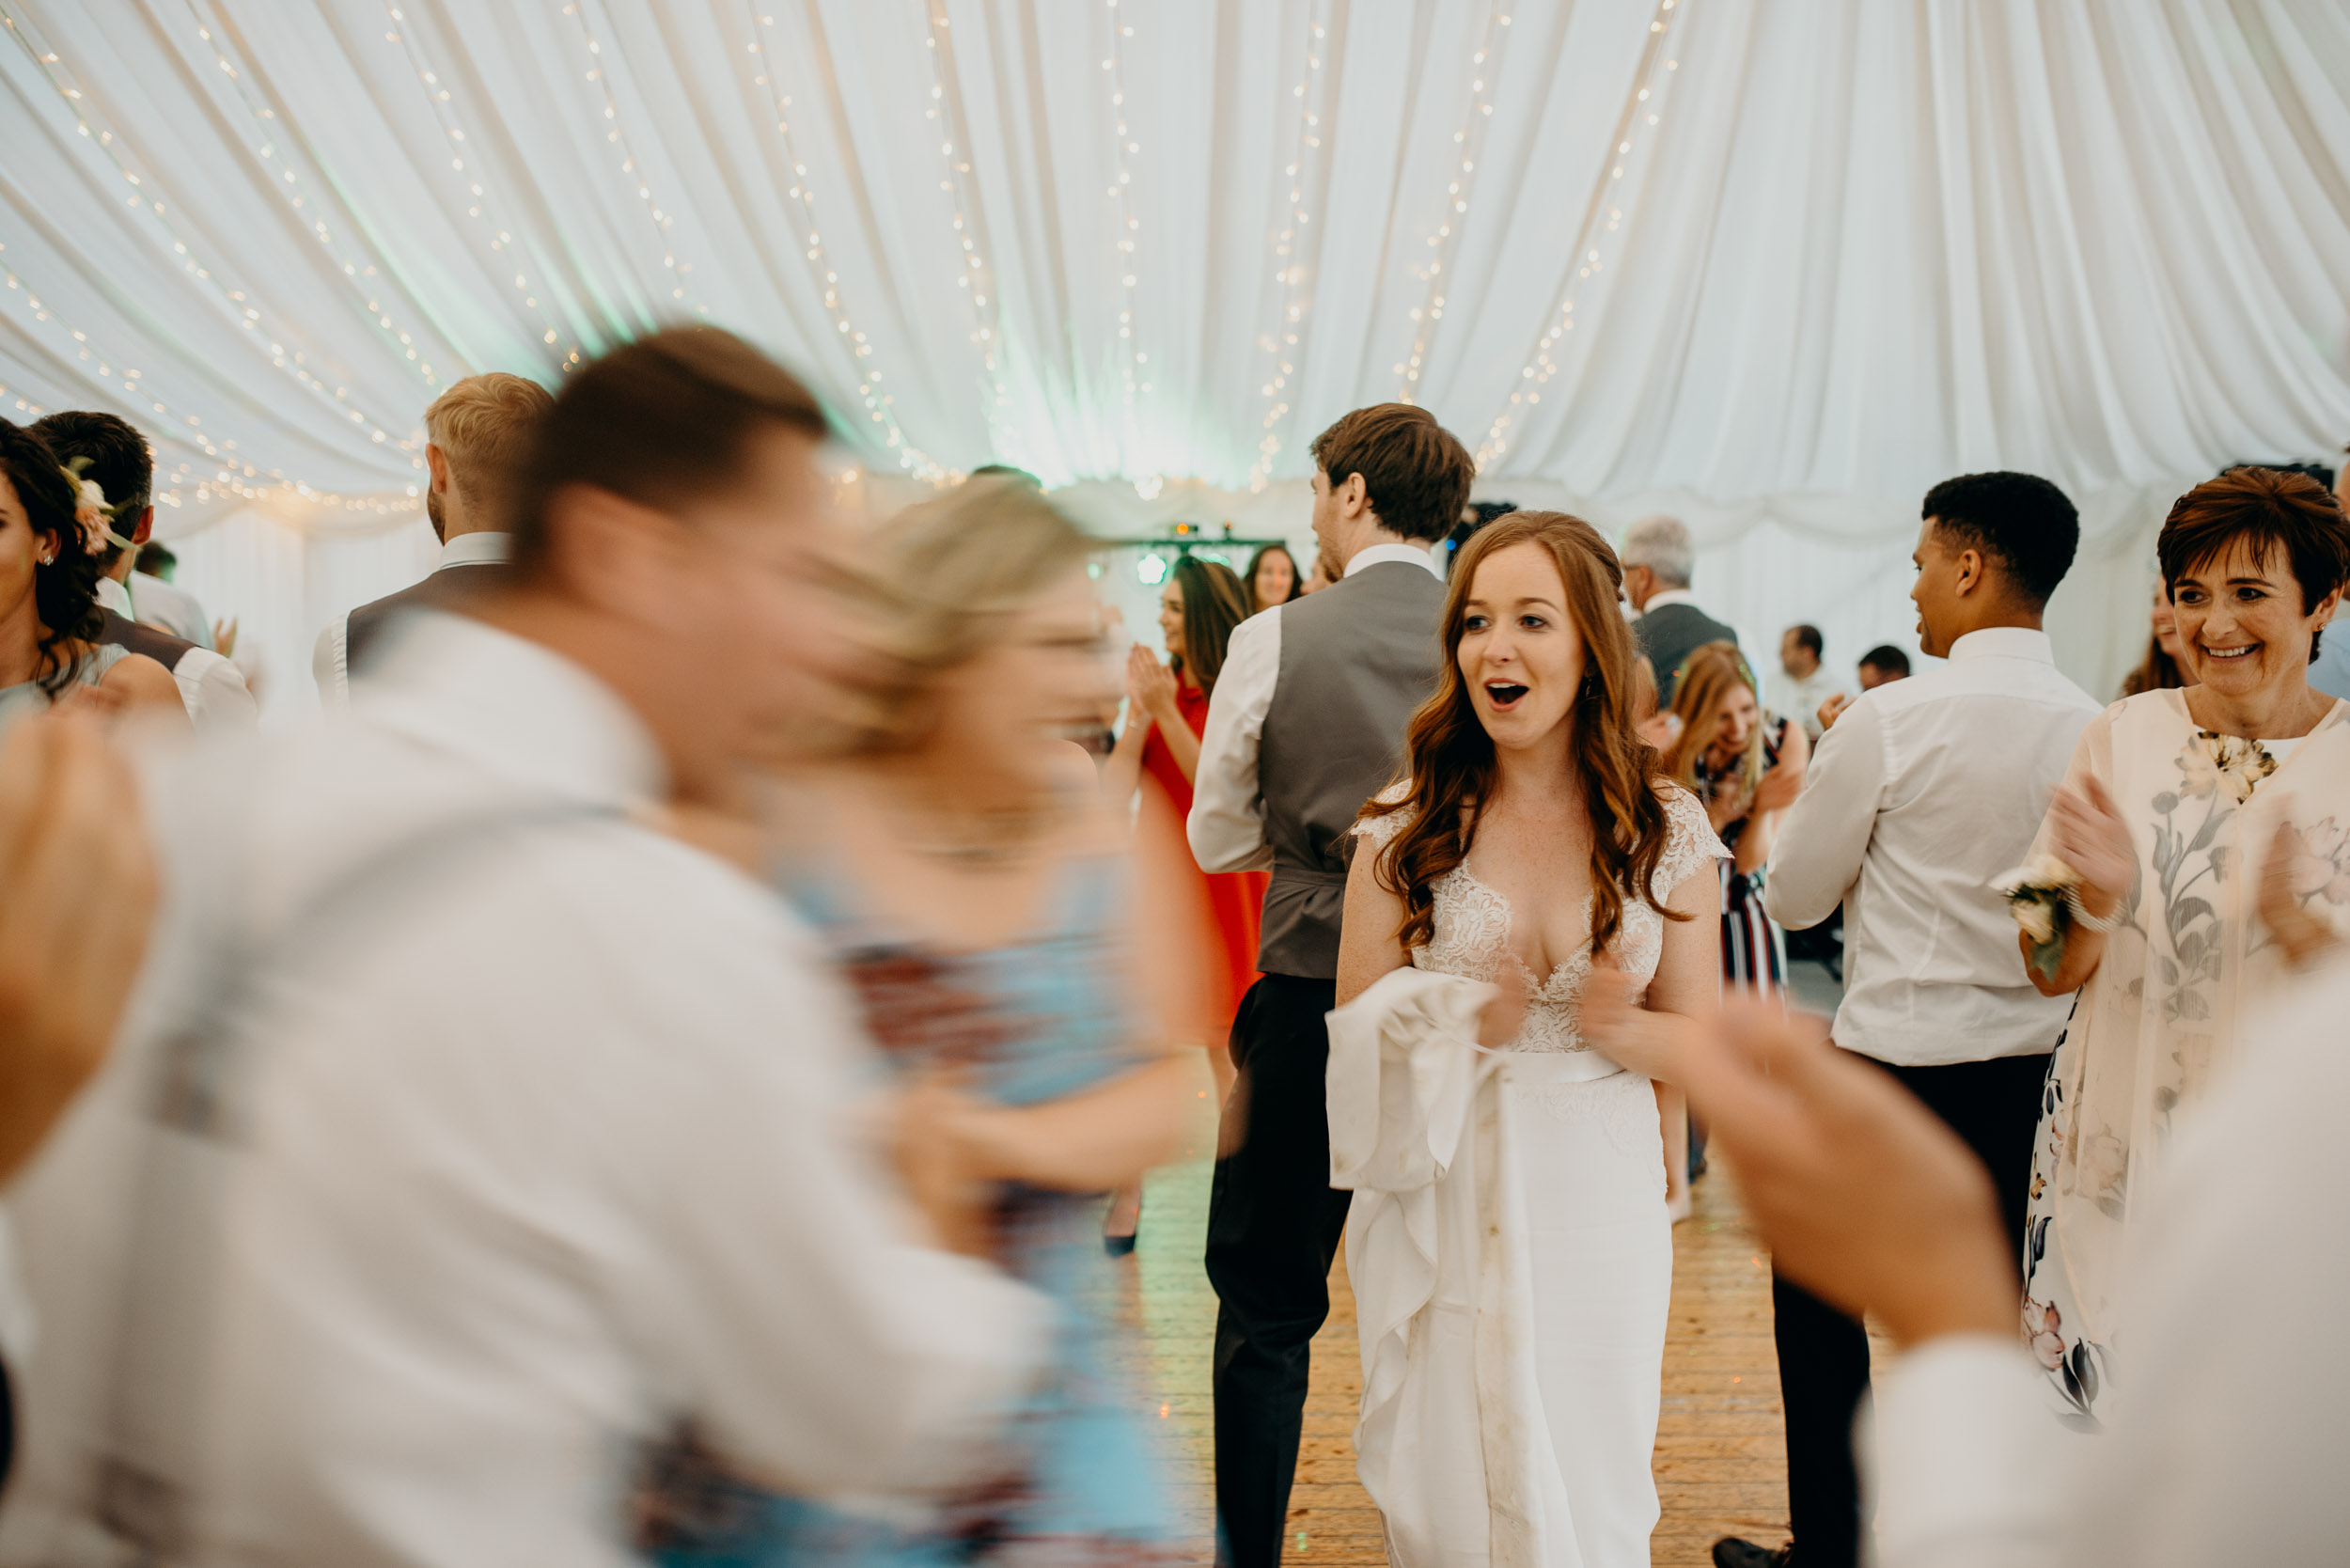 drenagh estate wedding photography-130.jpg